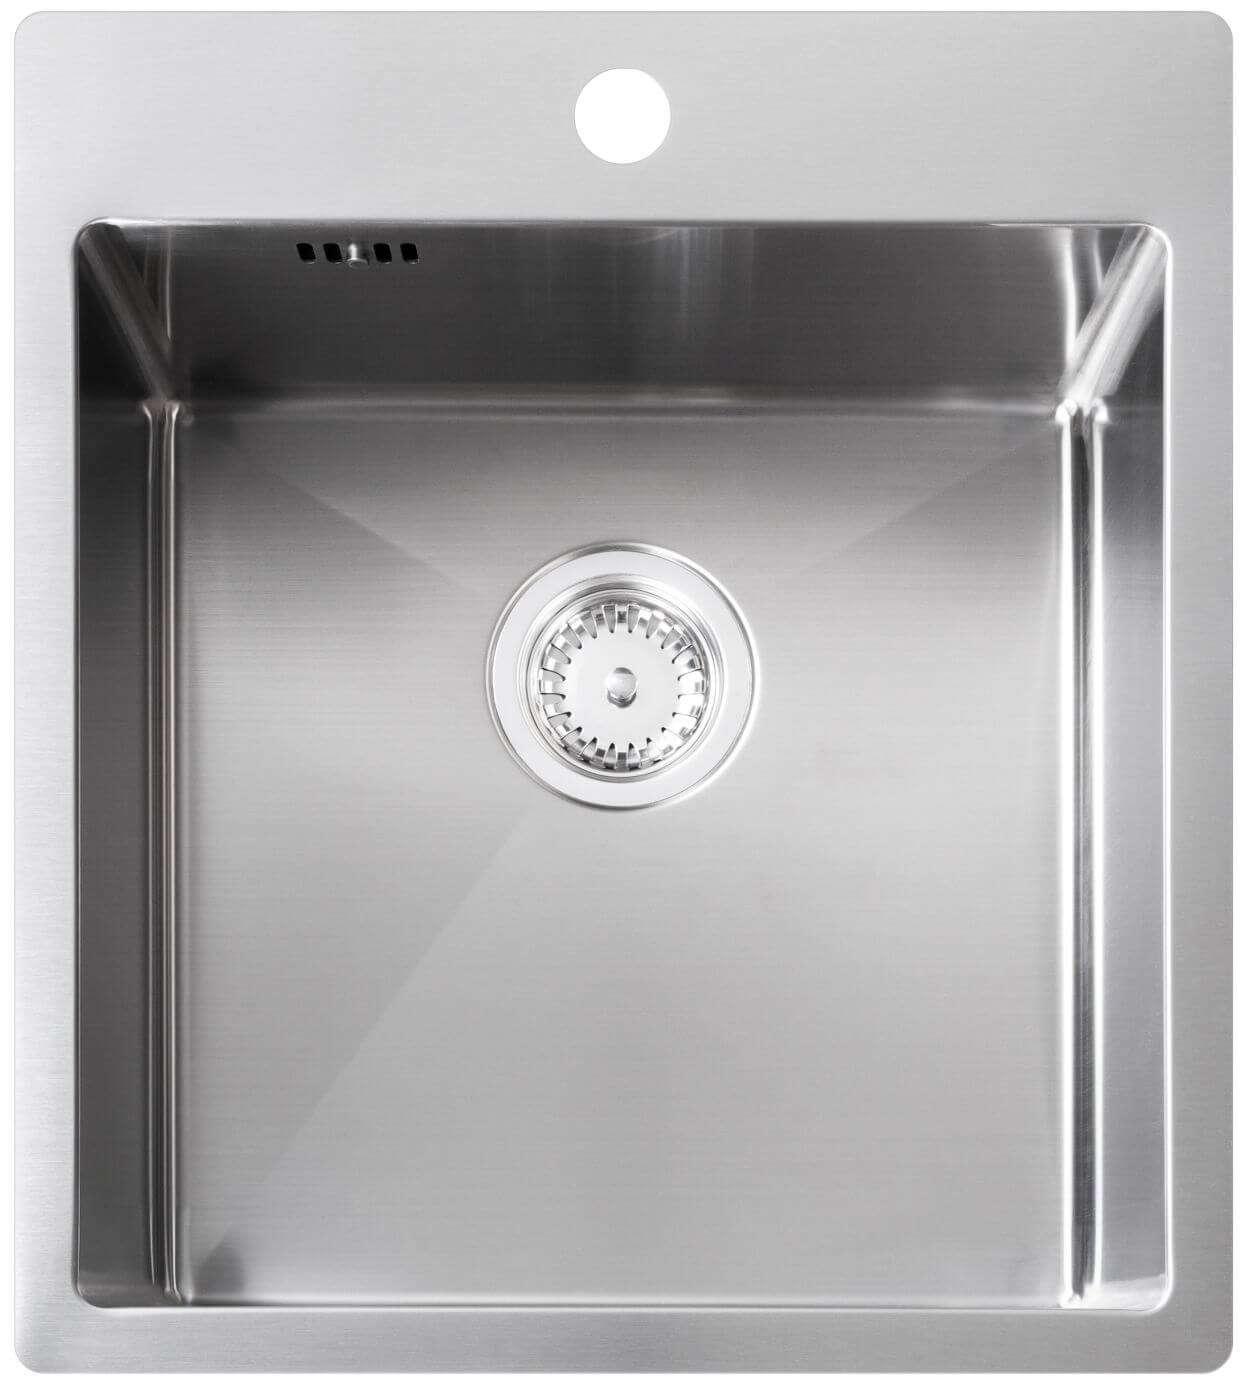 Waschbecken küche edelstahl  SHIGO Edelstahl Spülbecken CLUN1000X | spuelenhandel.de Online-Shop